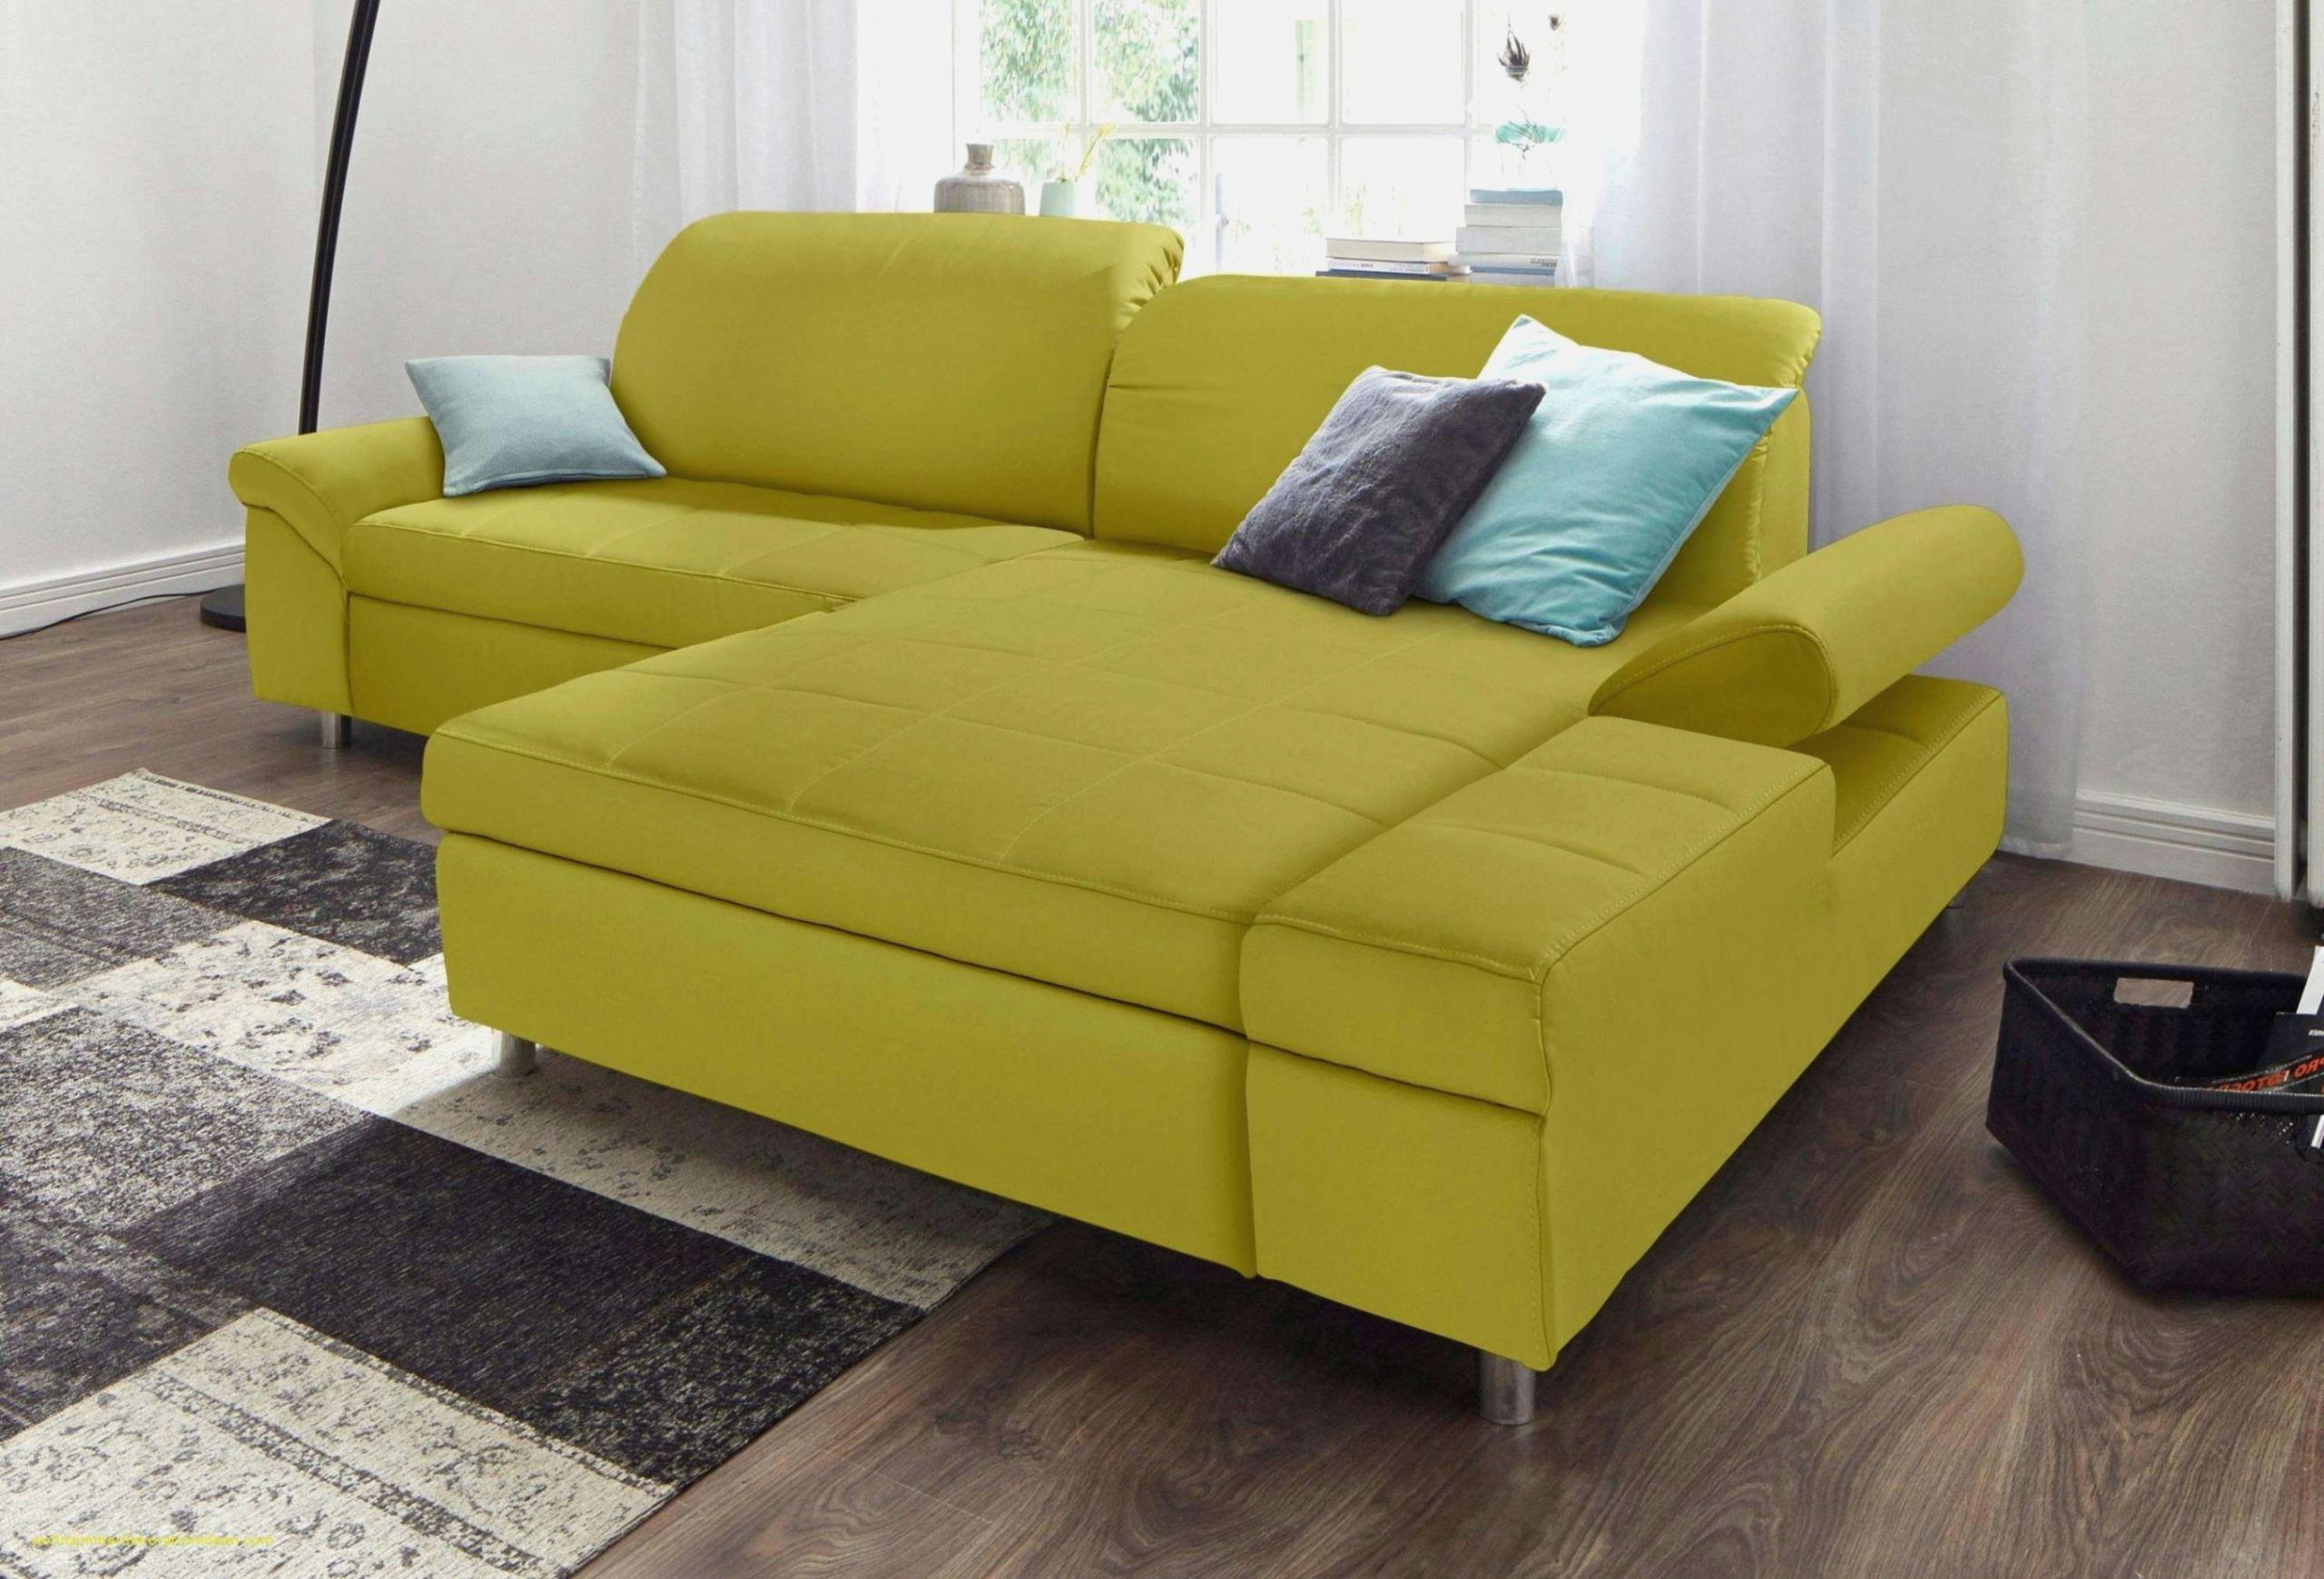 gunstige badmobel set elegant kuche fur drausen temobardz home blog of gunstige badmobel set 1 scaled